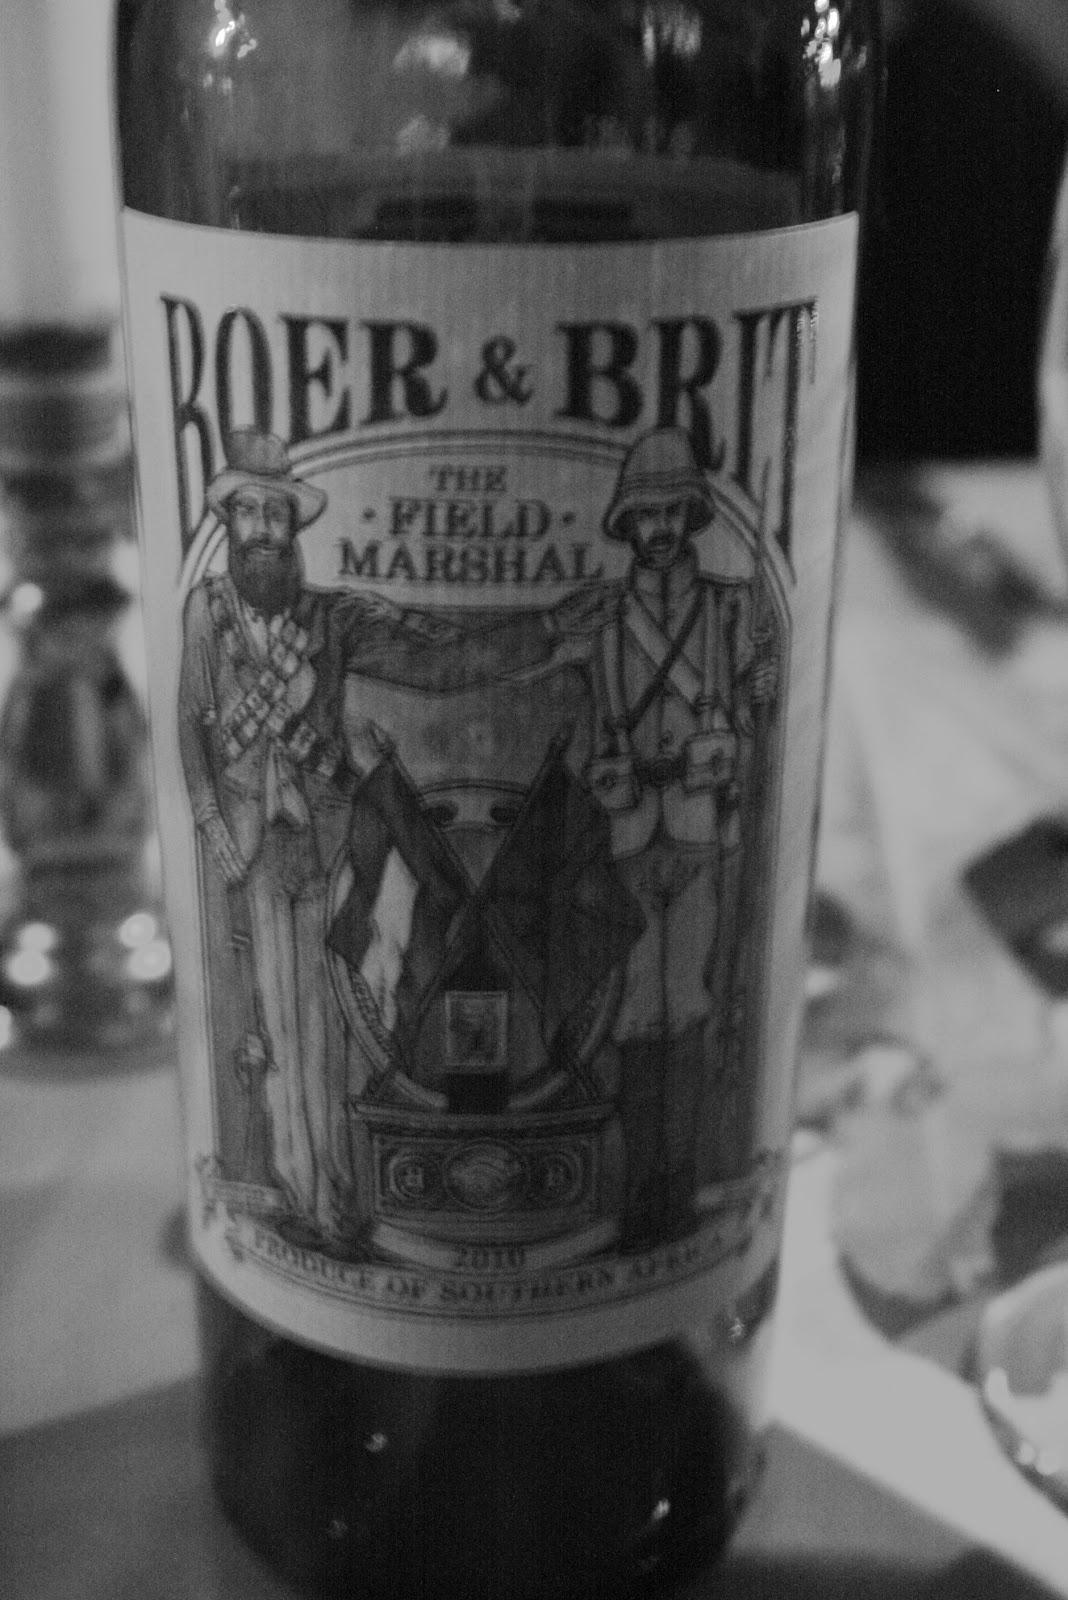 """Come Wine with us"" at Boer & Brit, Oude Wellington Estate | BOER%BRIT"